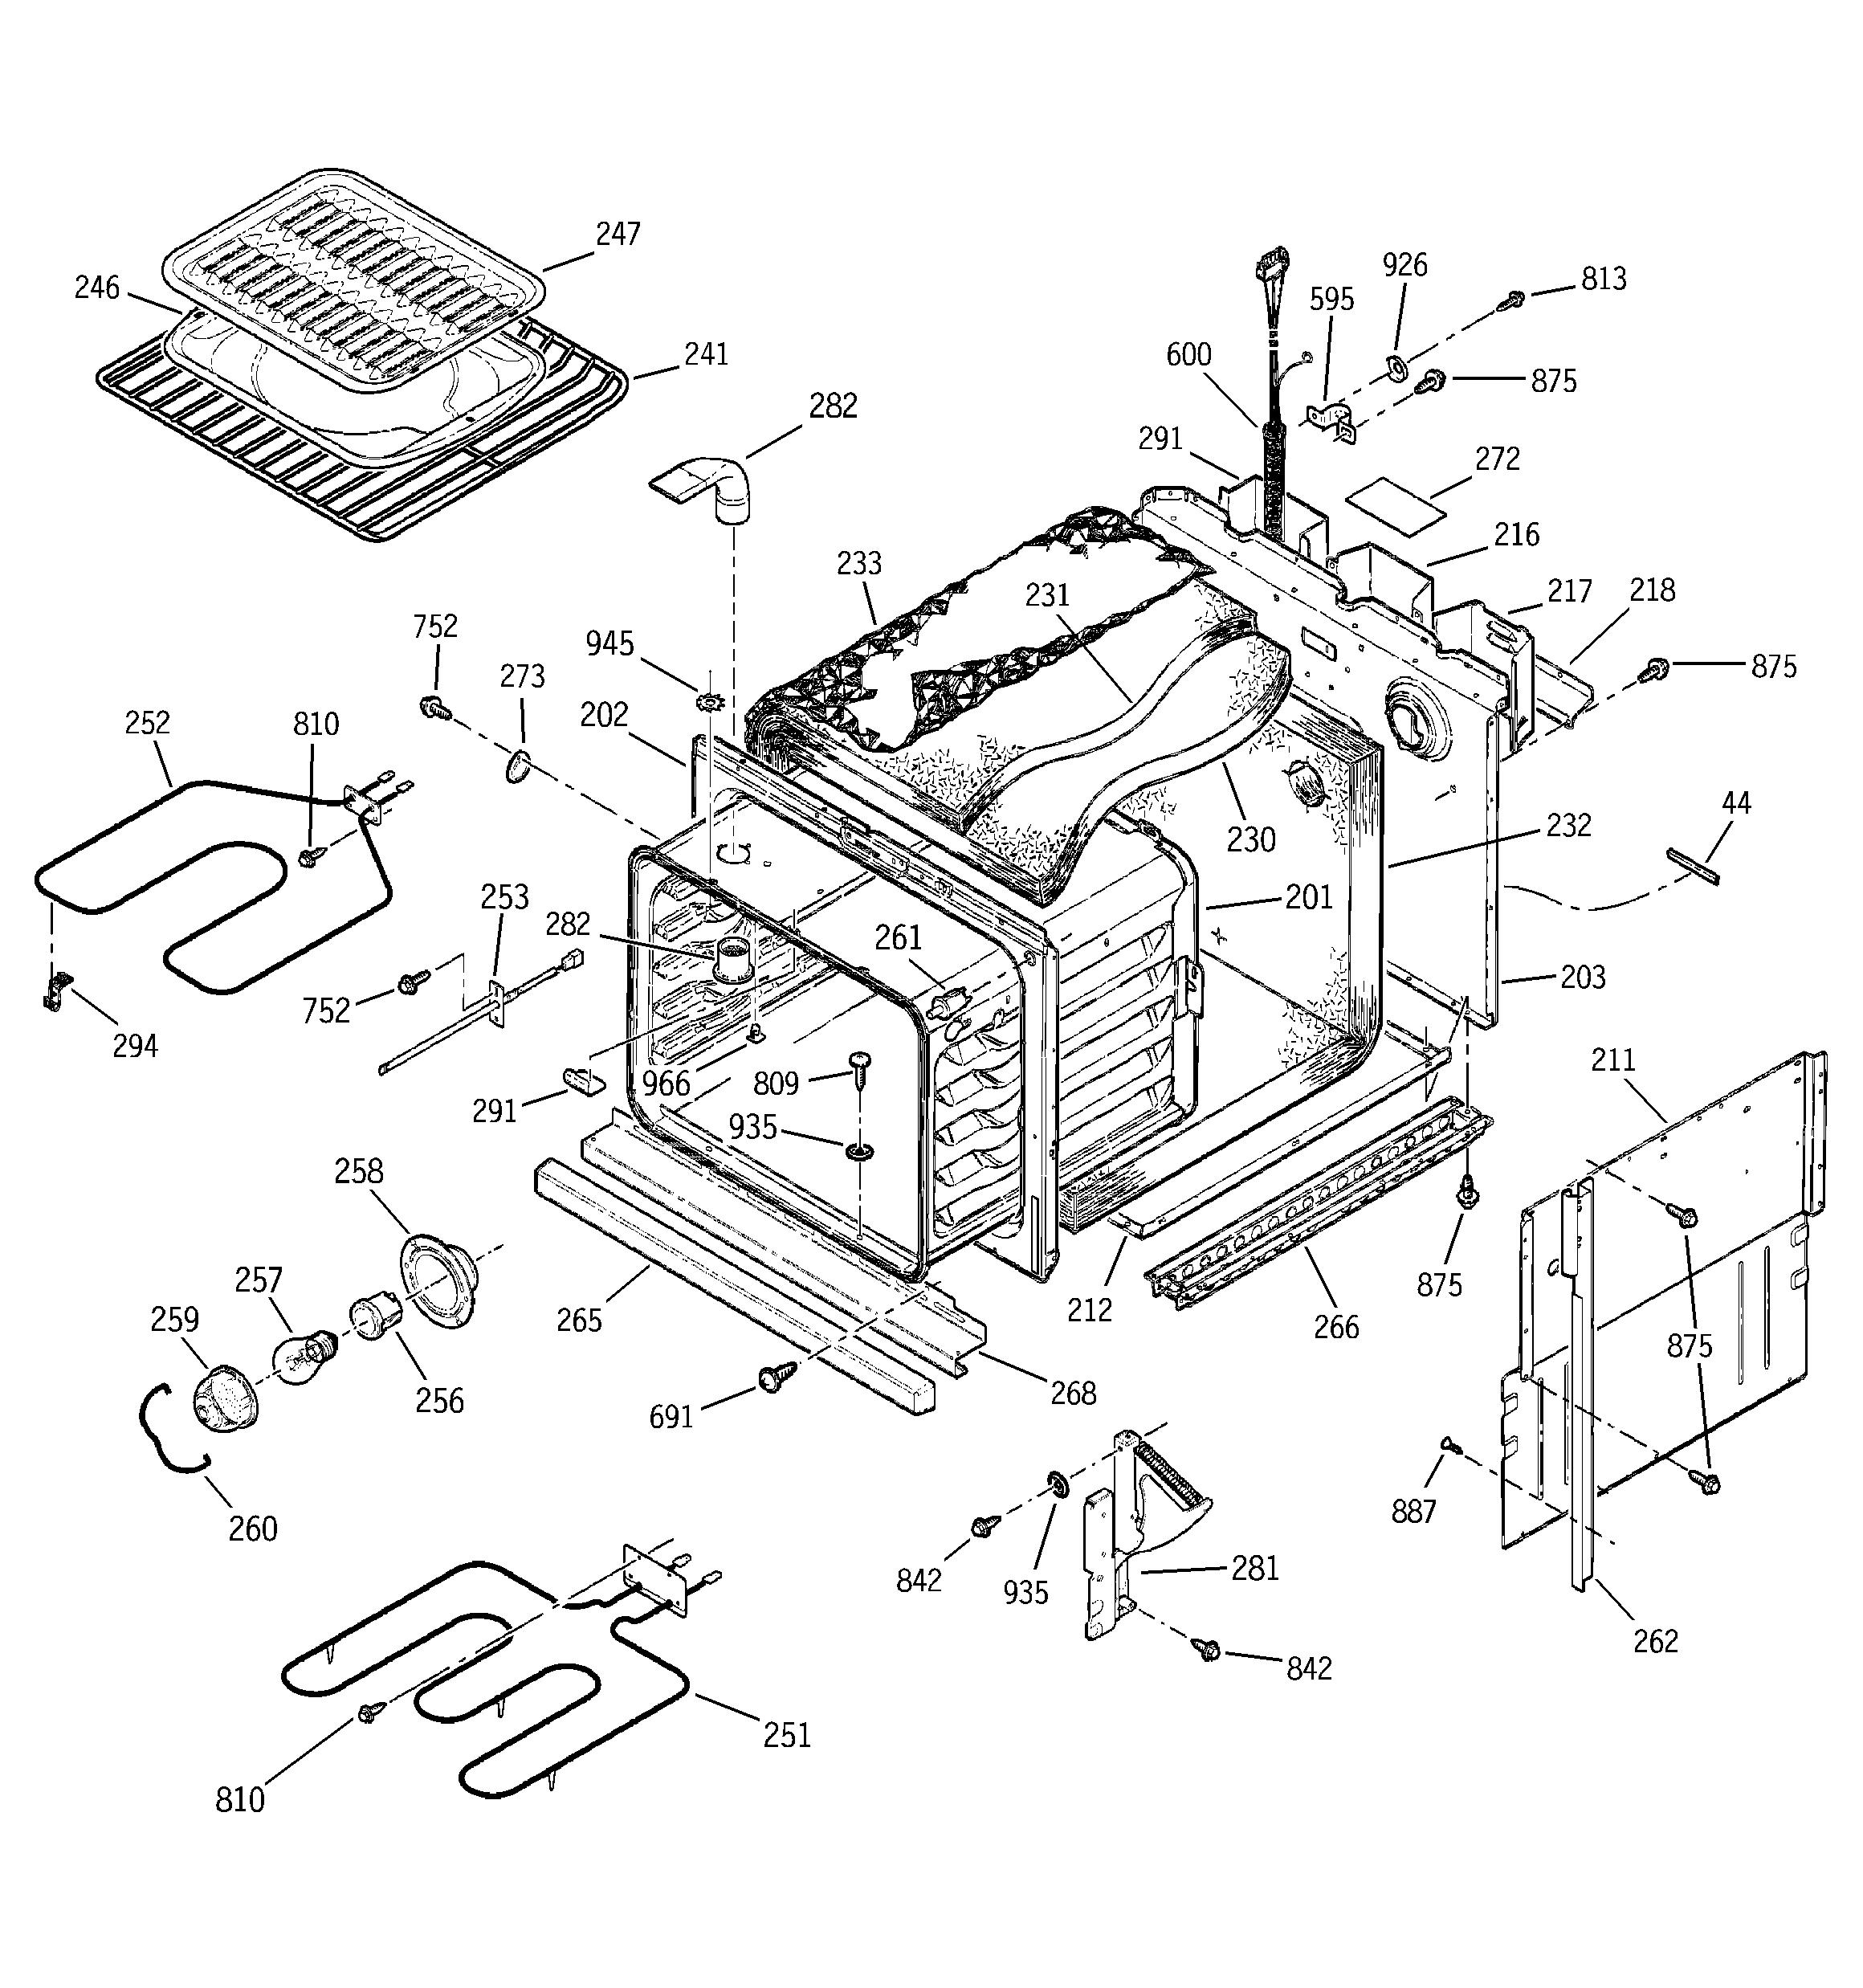 ge profile range wiring diagram fw 7376  door lock diagram and parts list for ge wallovenparts  door lock diagram and parts list for ge